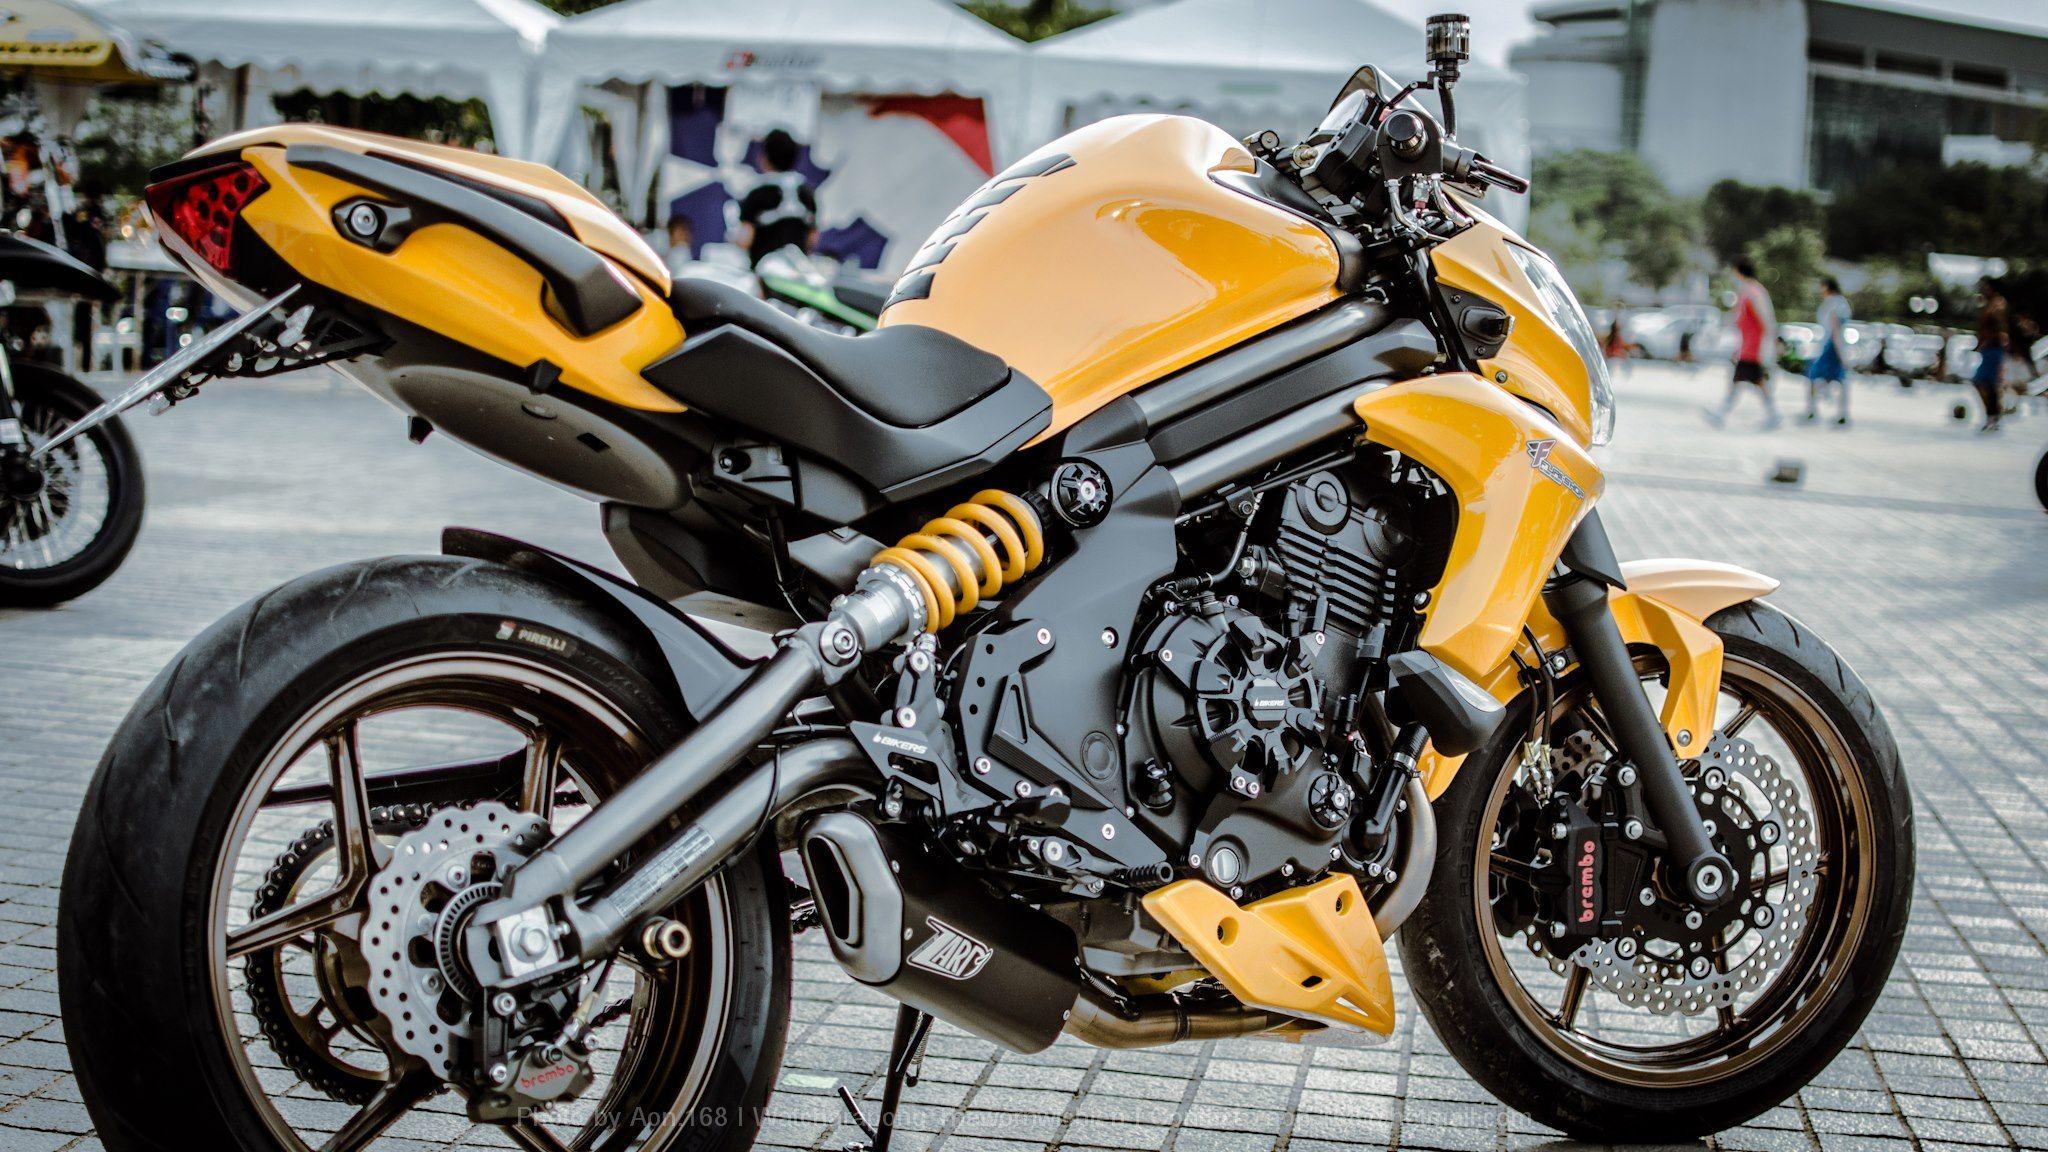 ER-6N PICs - Page 96 - KawiForums - Kawasaki Motorcycle Forums